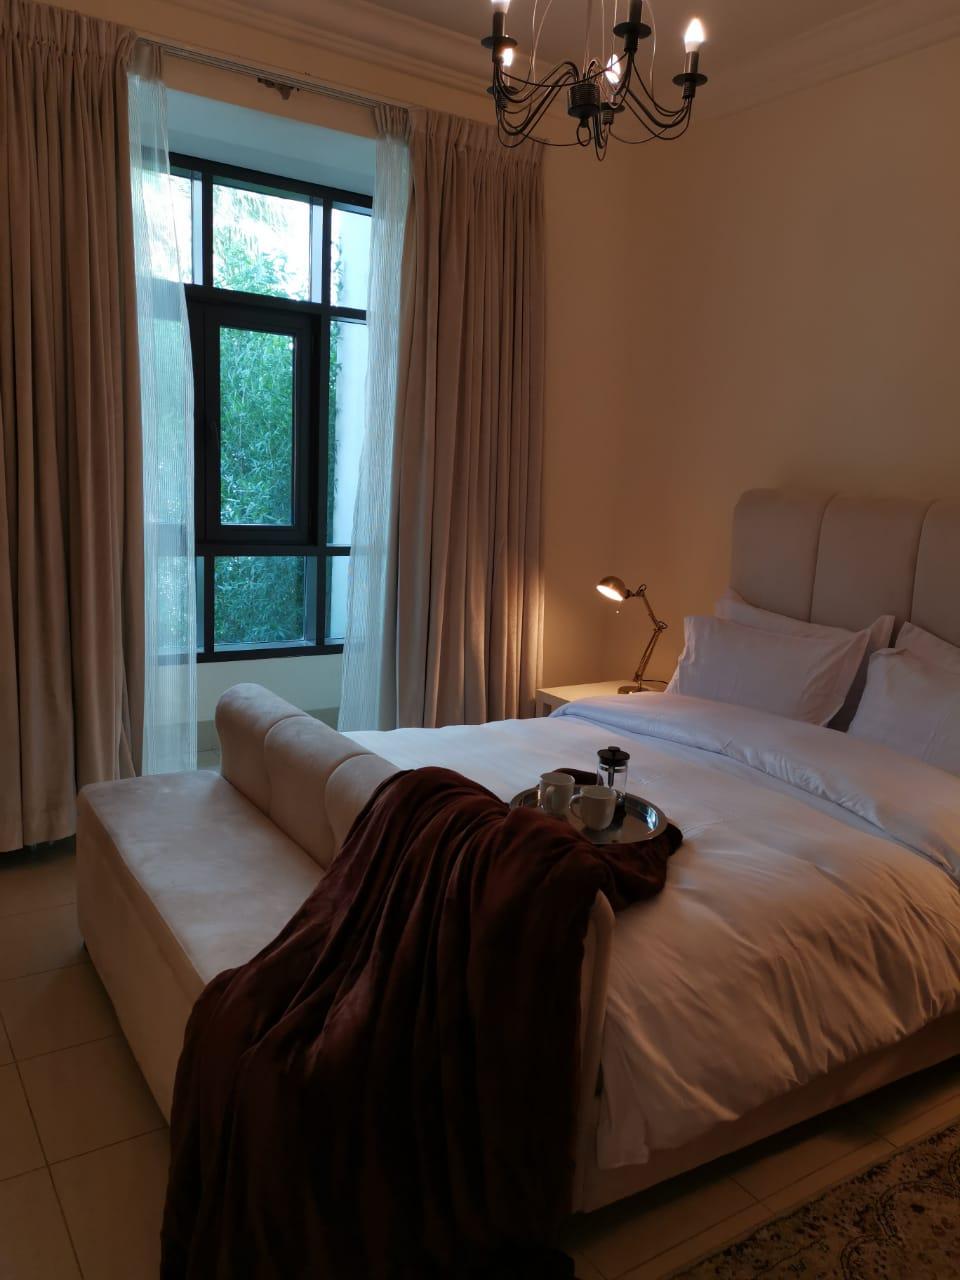 Wonderful stay in the heart of Dubai - SouK Al Bahar photo 27263141